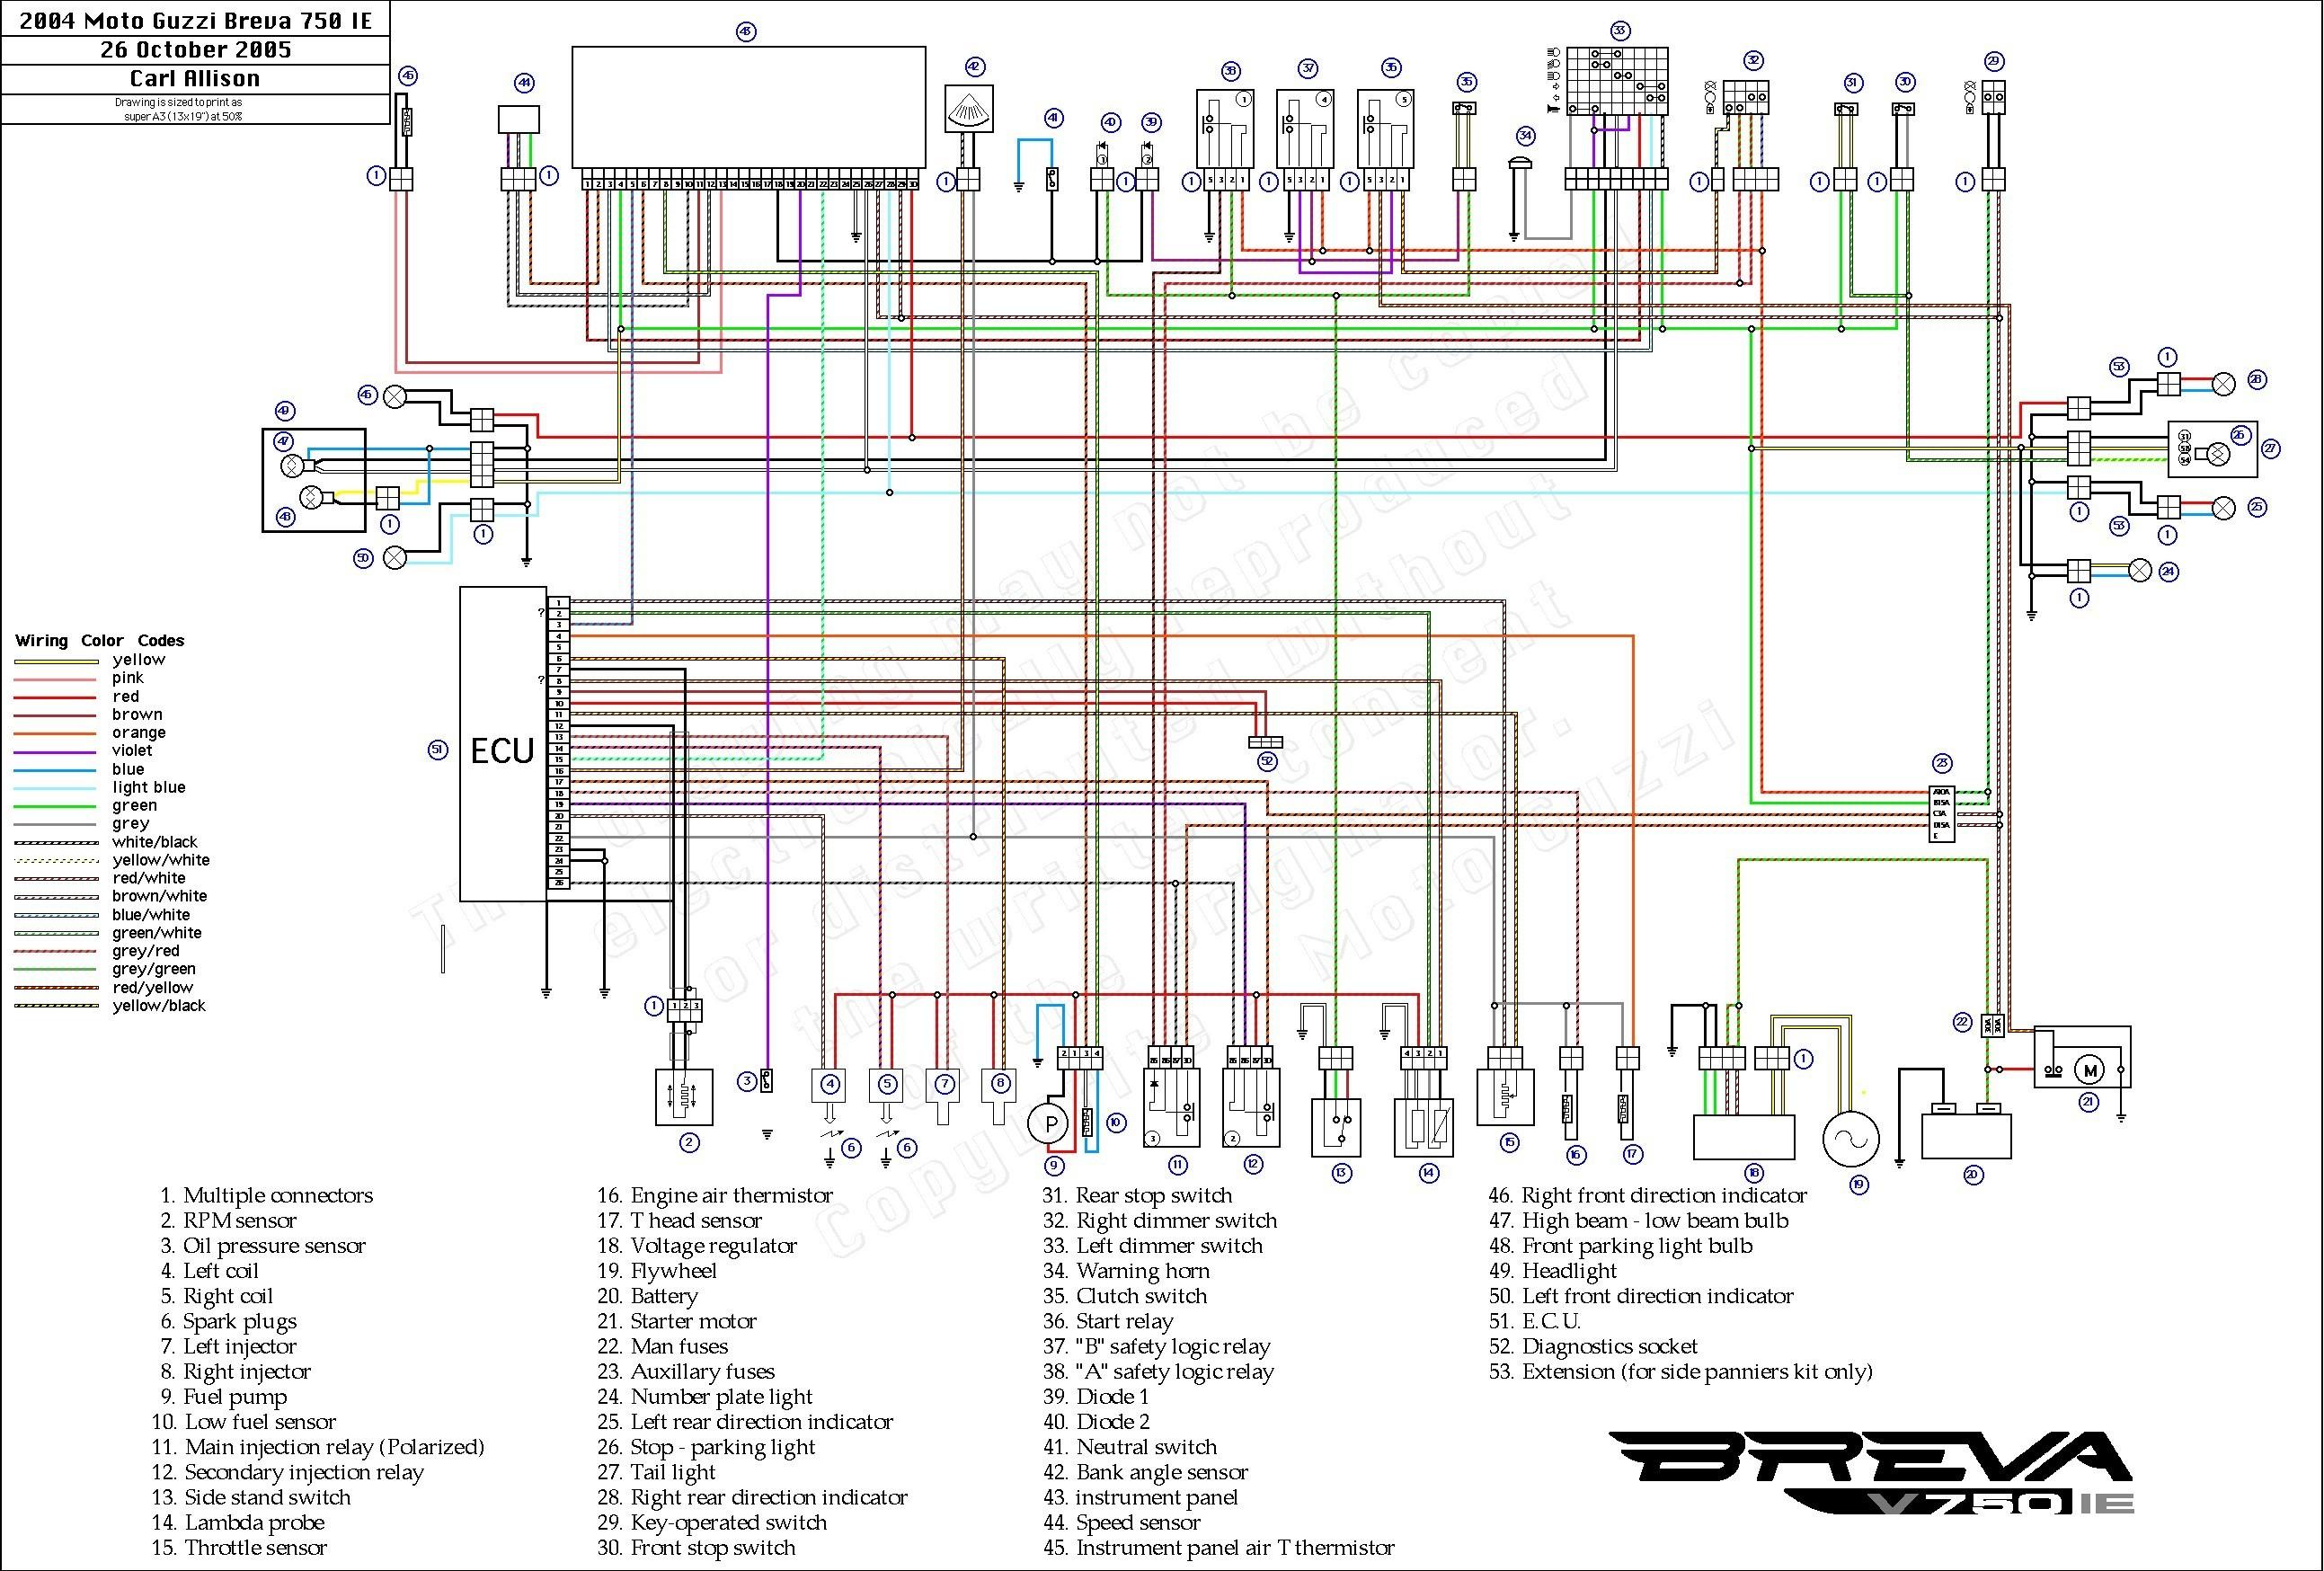 Enginew Iring Diagram 2003 Dodge Ram 5.7 Hemi 5 7 Hemi Ignition Wiring Diagram Full Hd Version Wiring Of Enginew Iring Diagram 2003 Dodge Ram 5.7 Hemi